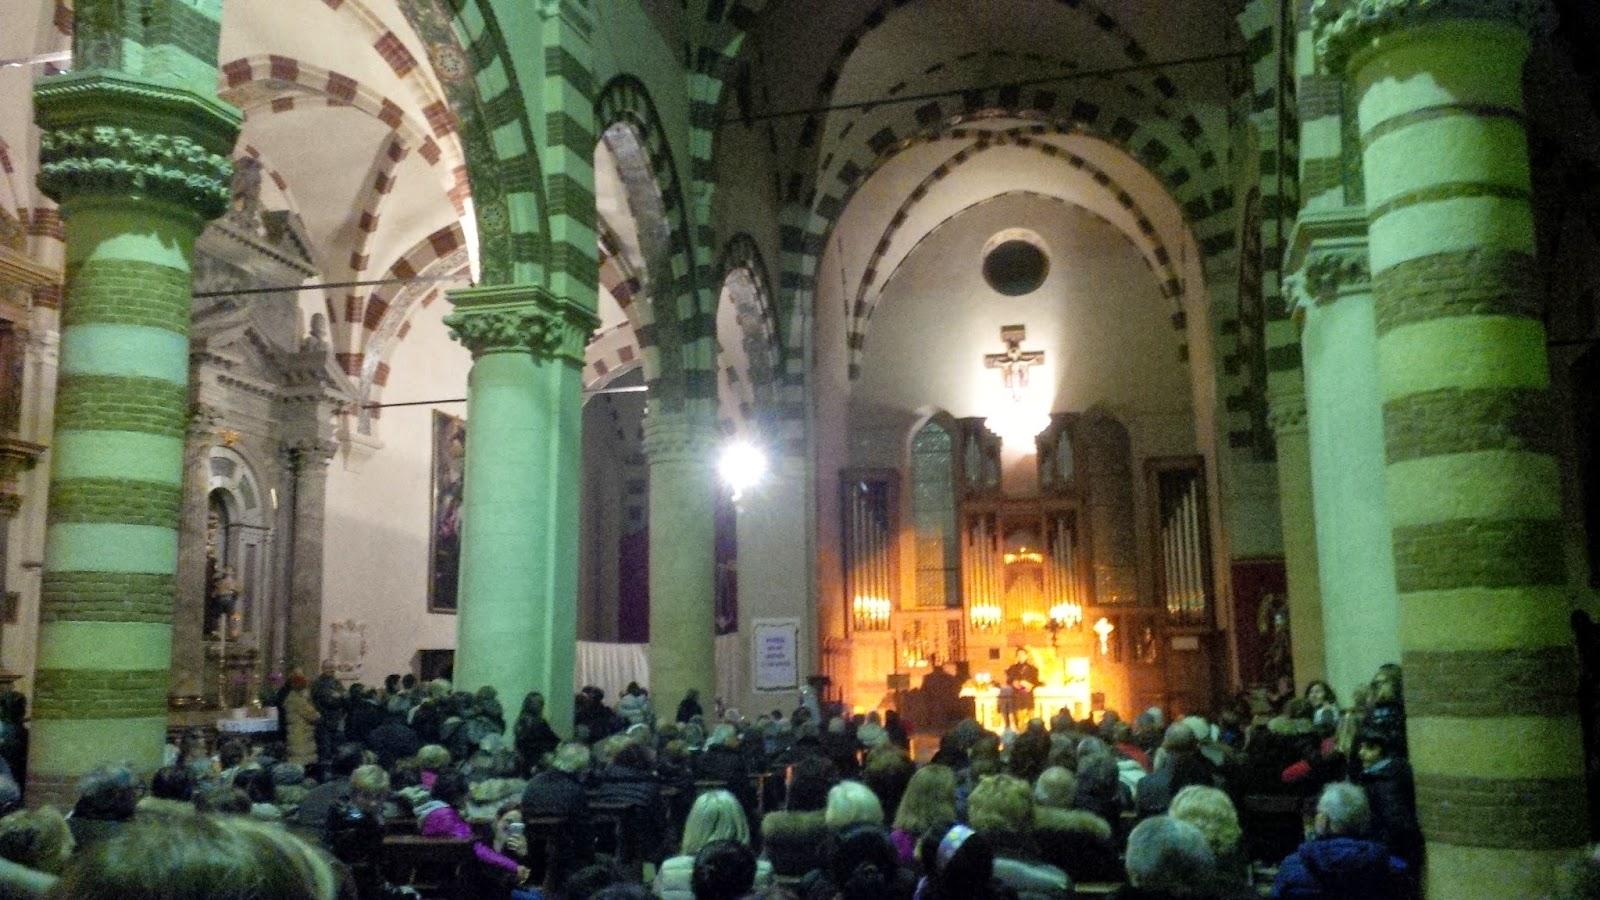 Inside the Chiesa dei Servi